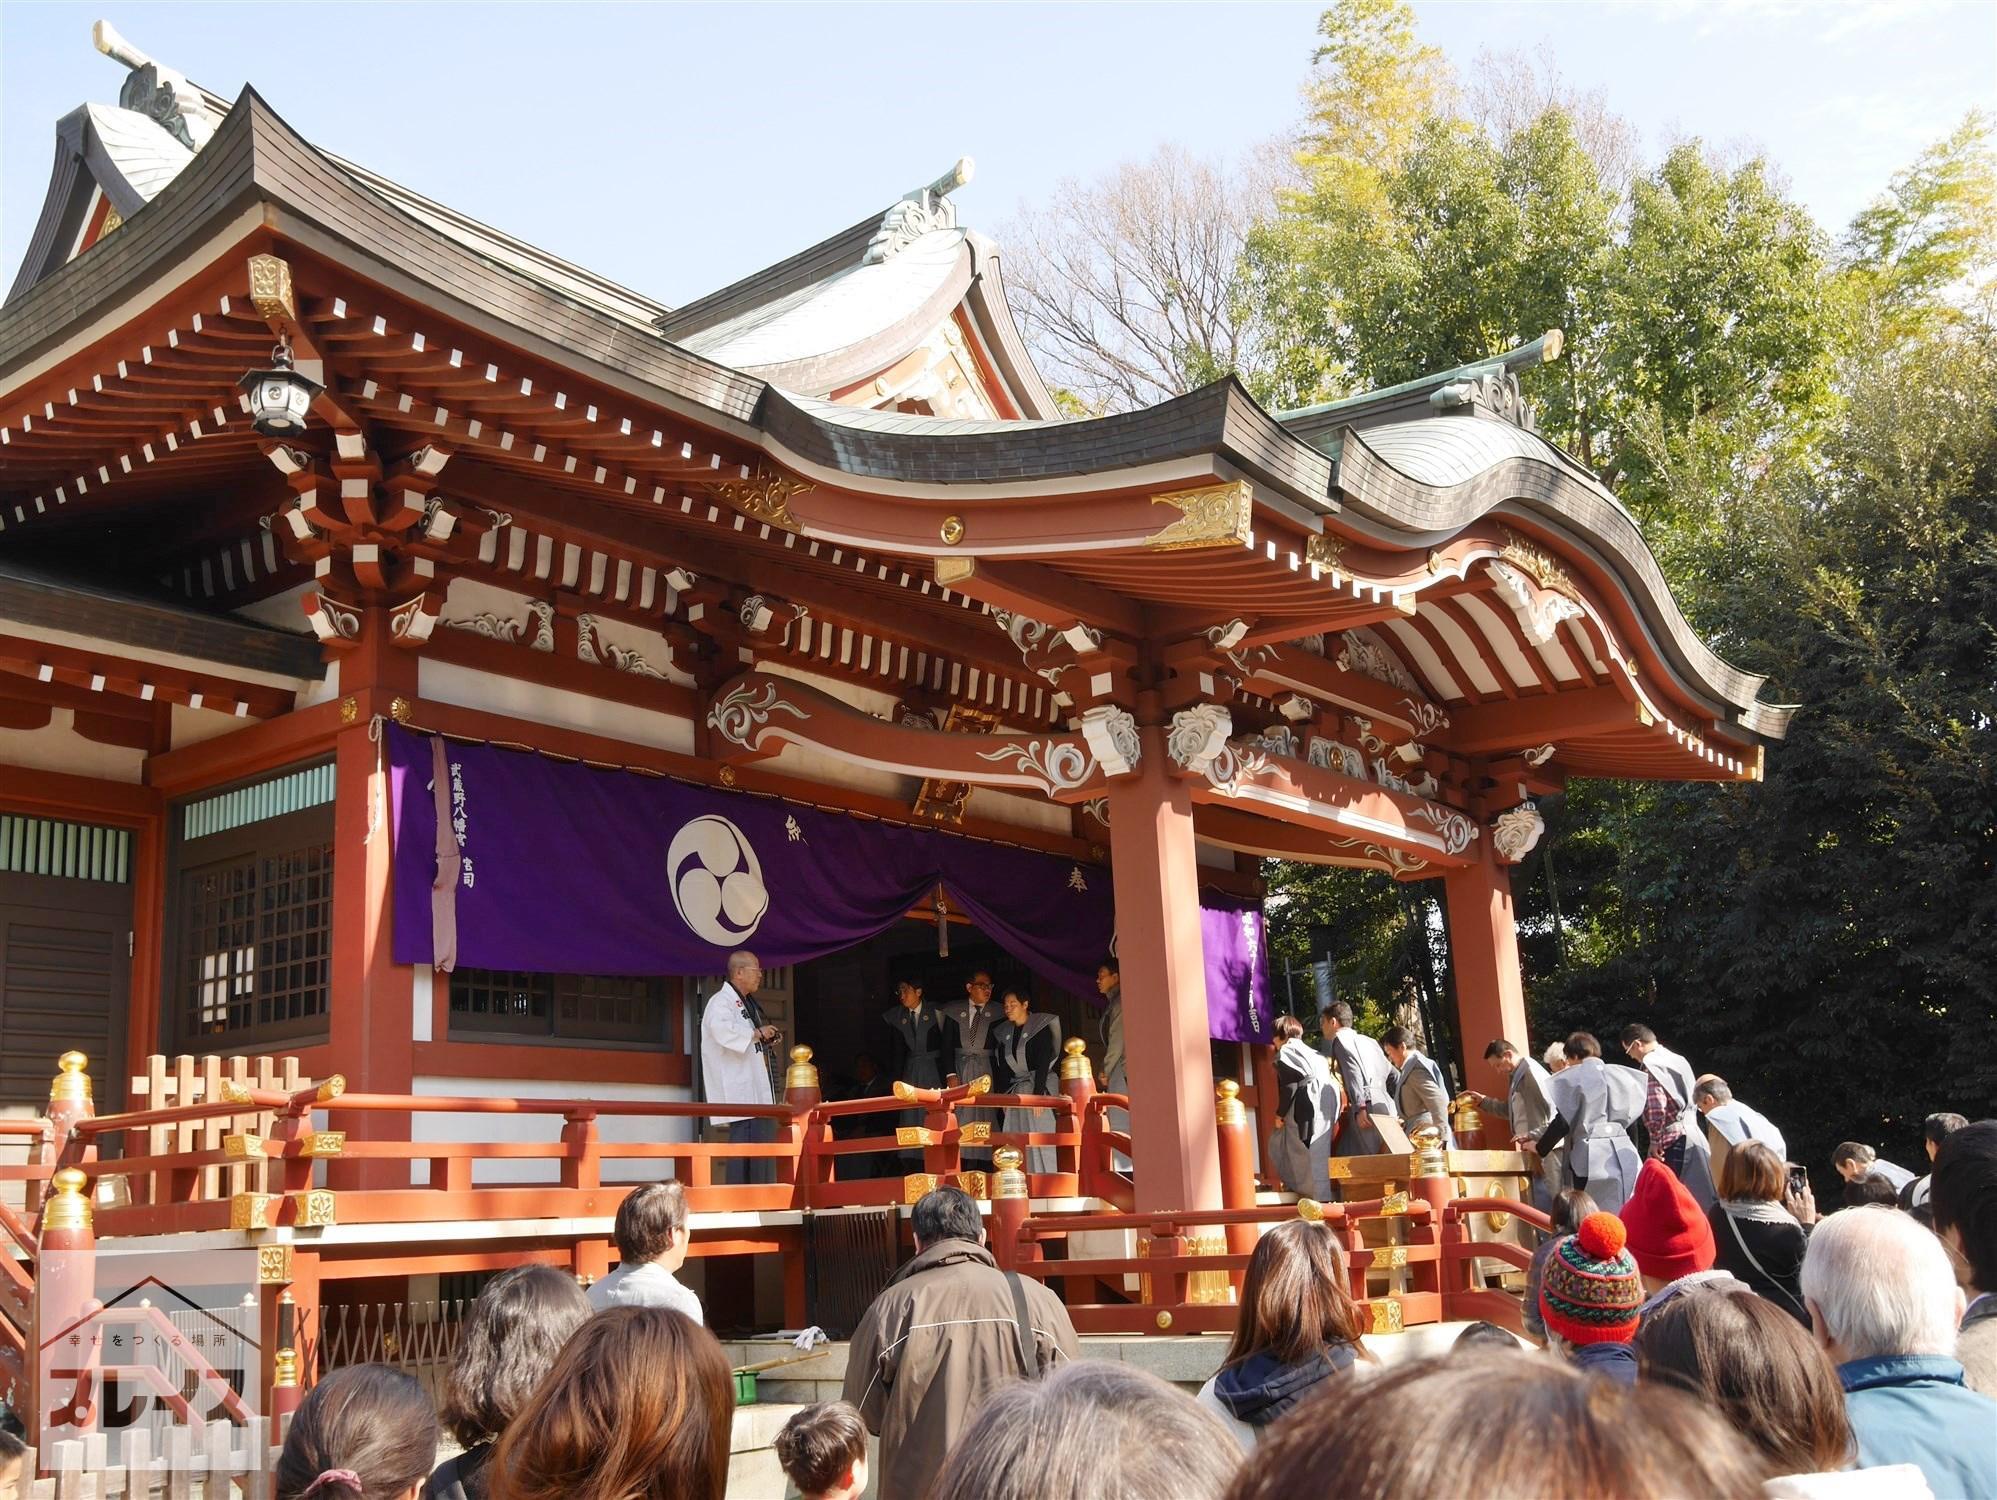 LA20190203-武蔵野八幡宮-節分祭 (11).jpg